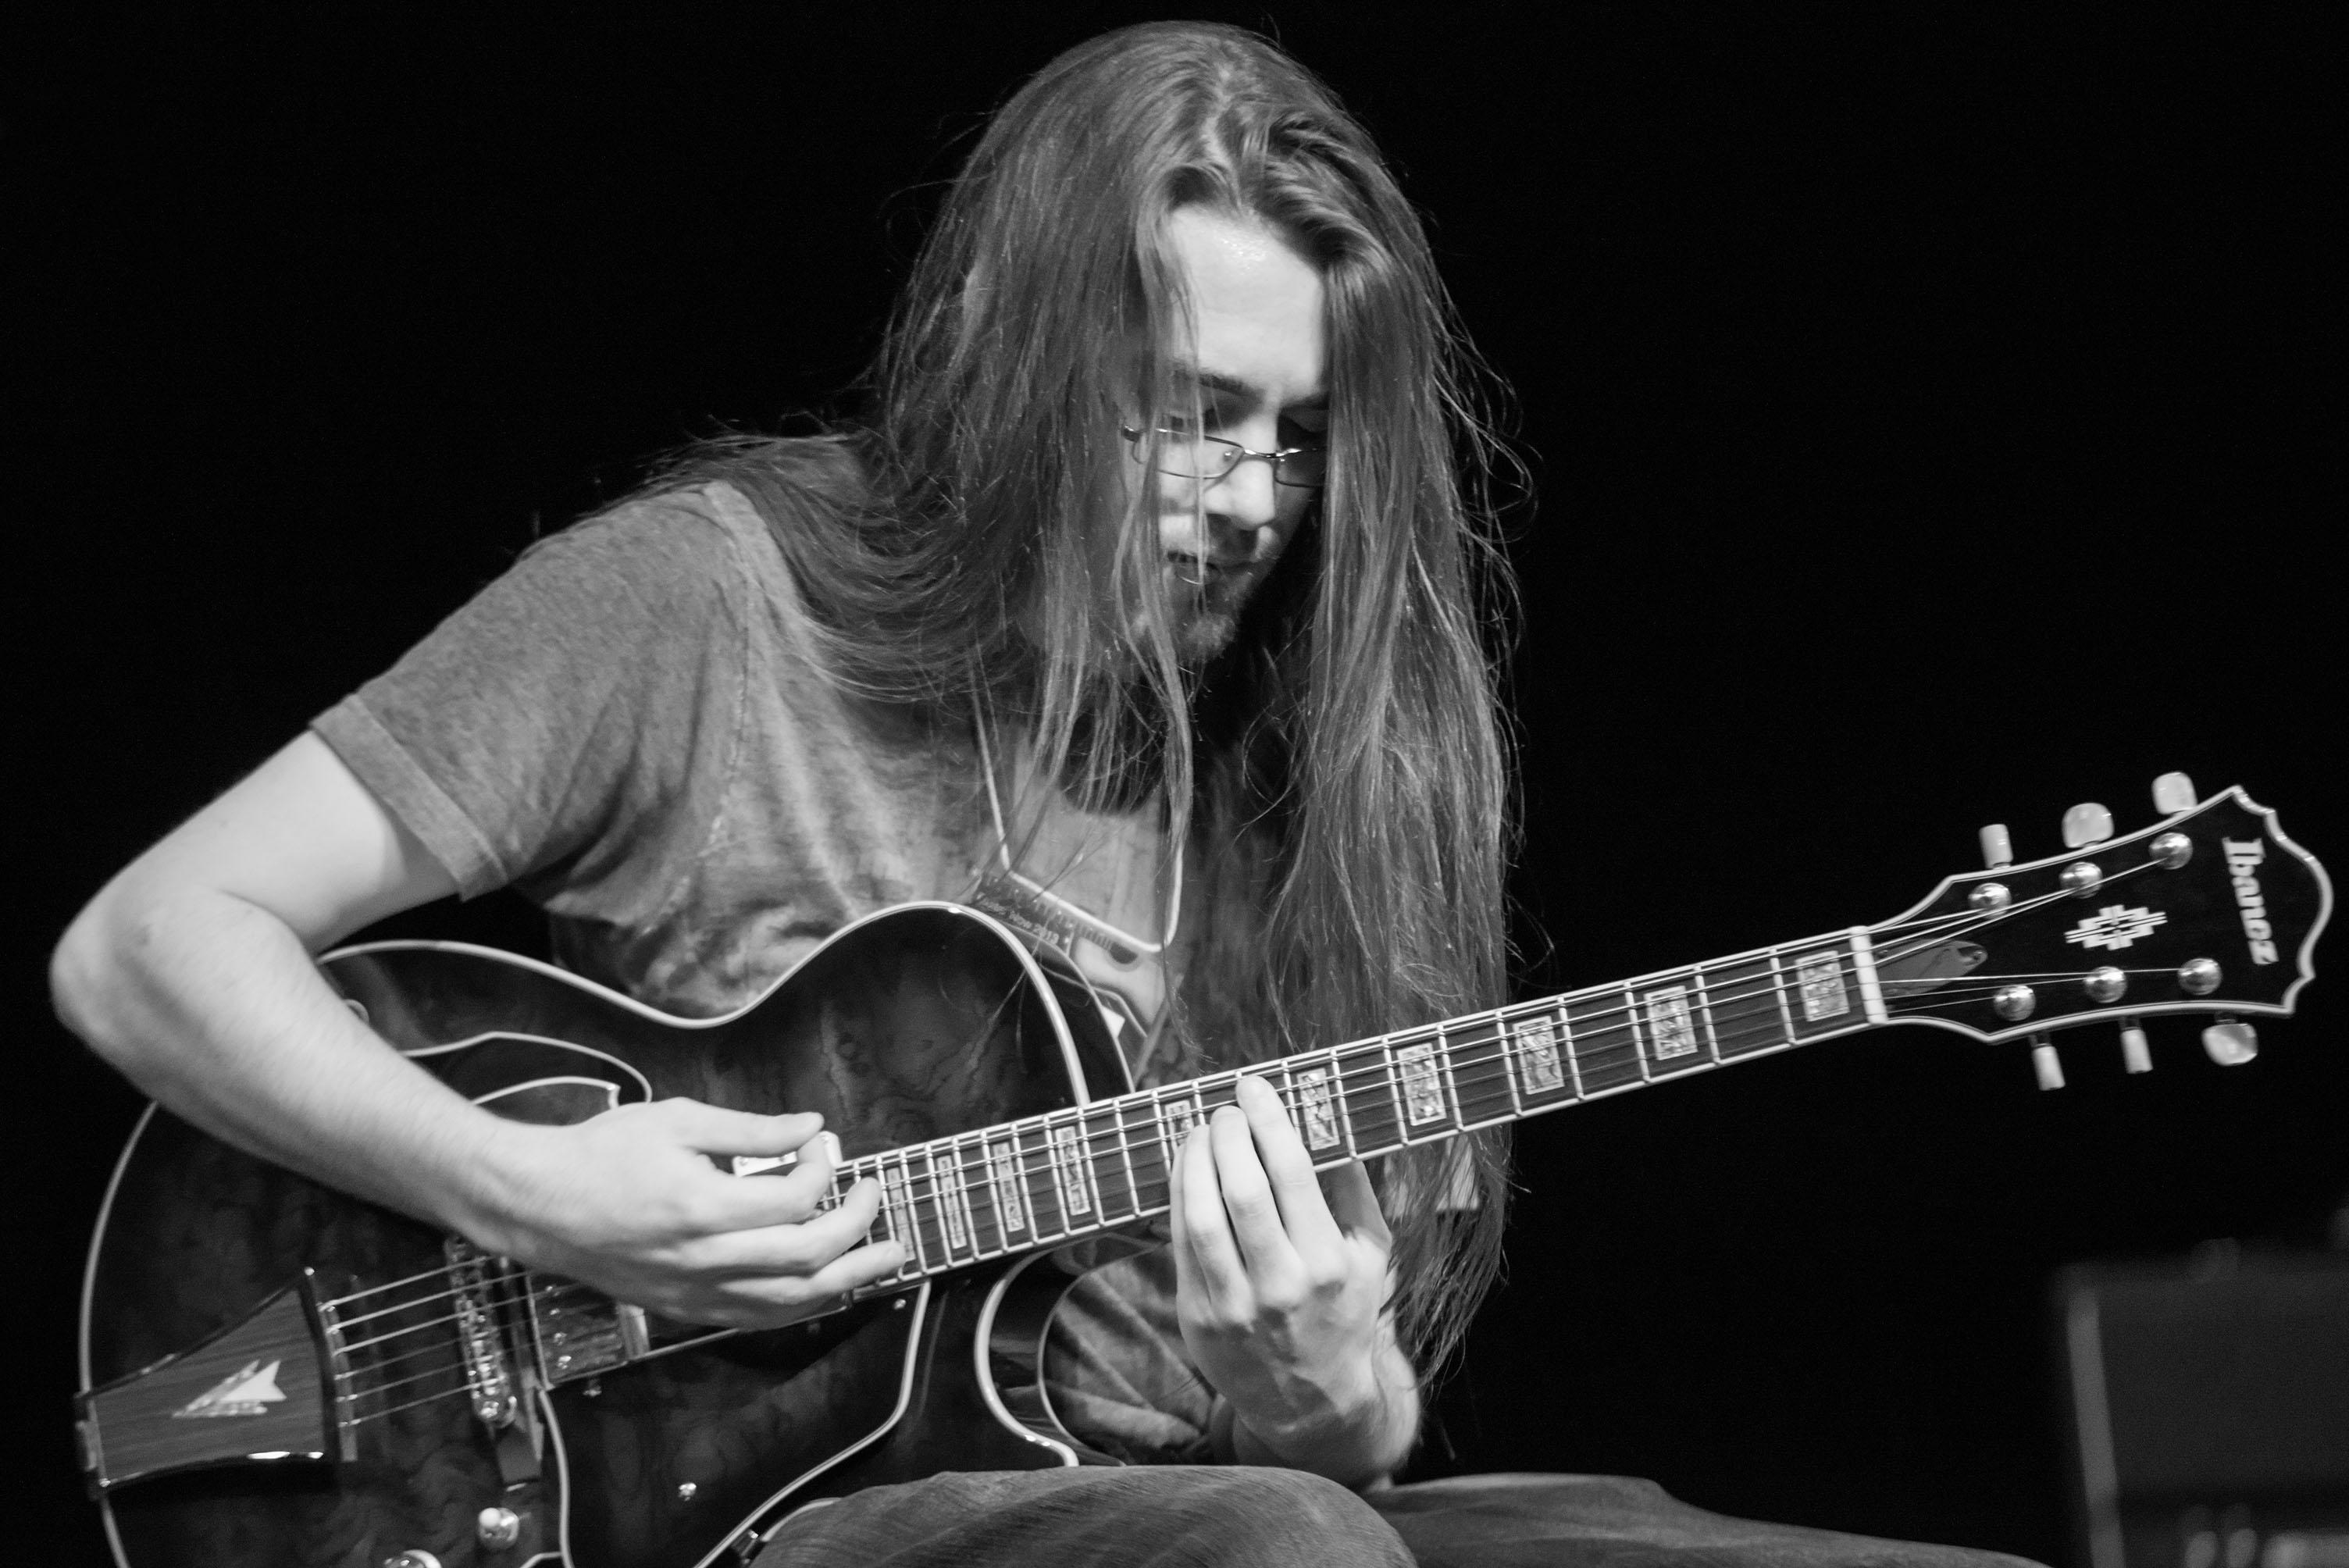 Guitar competition, guitarnow! 2013